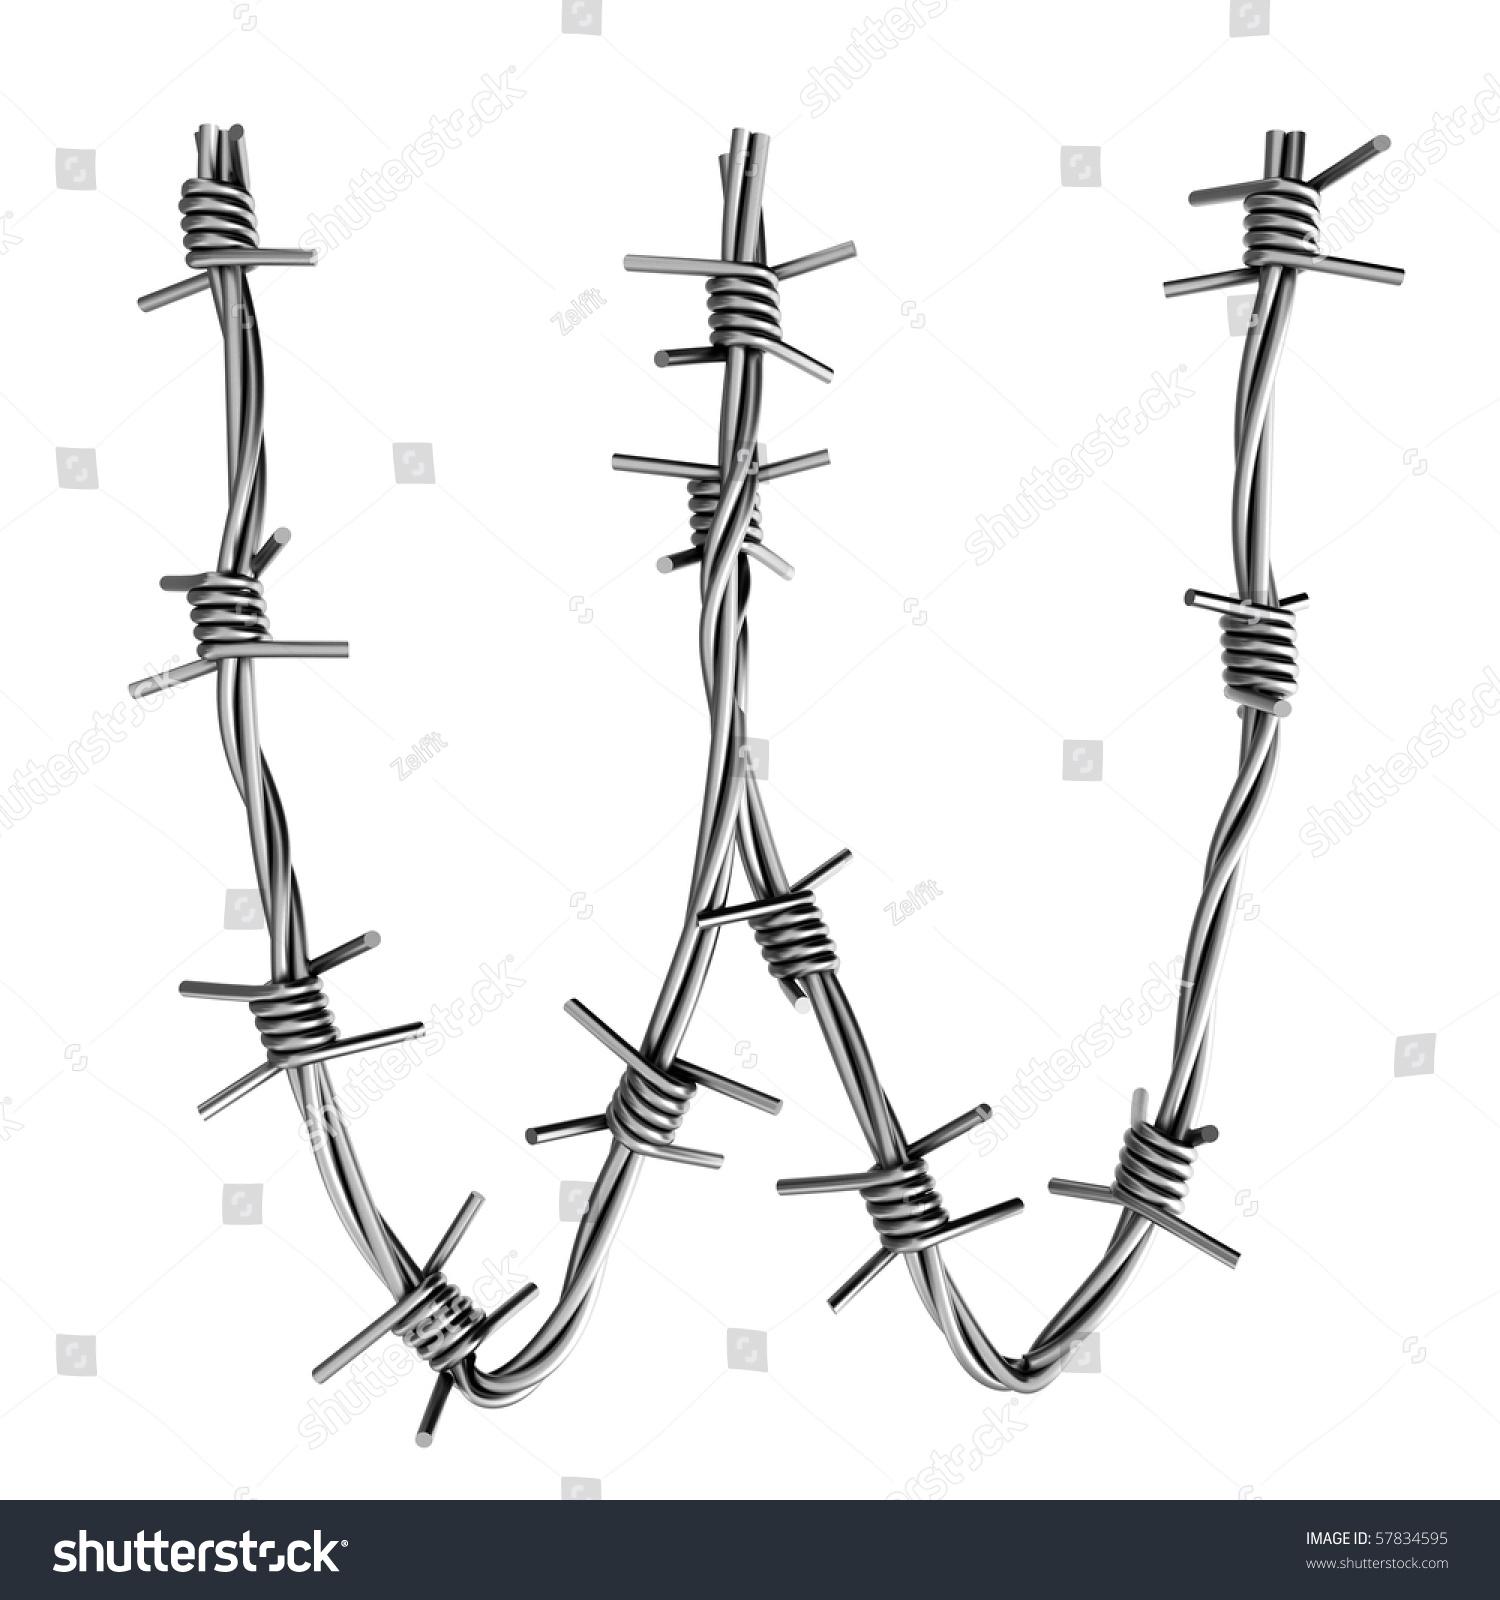 Barbed wire alphabet w stock illustration